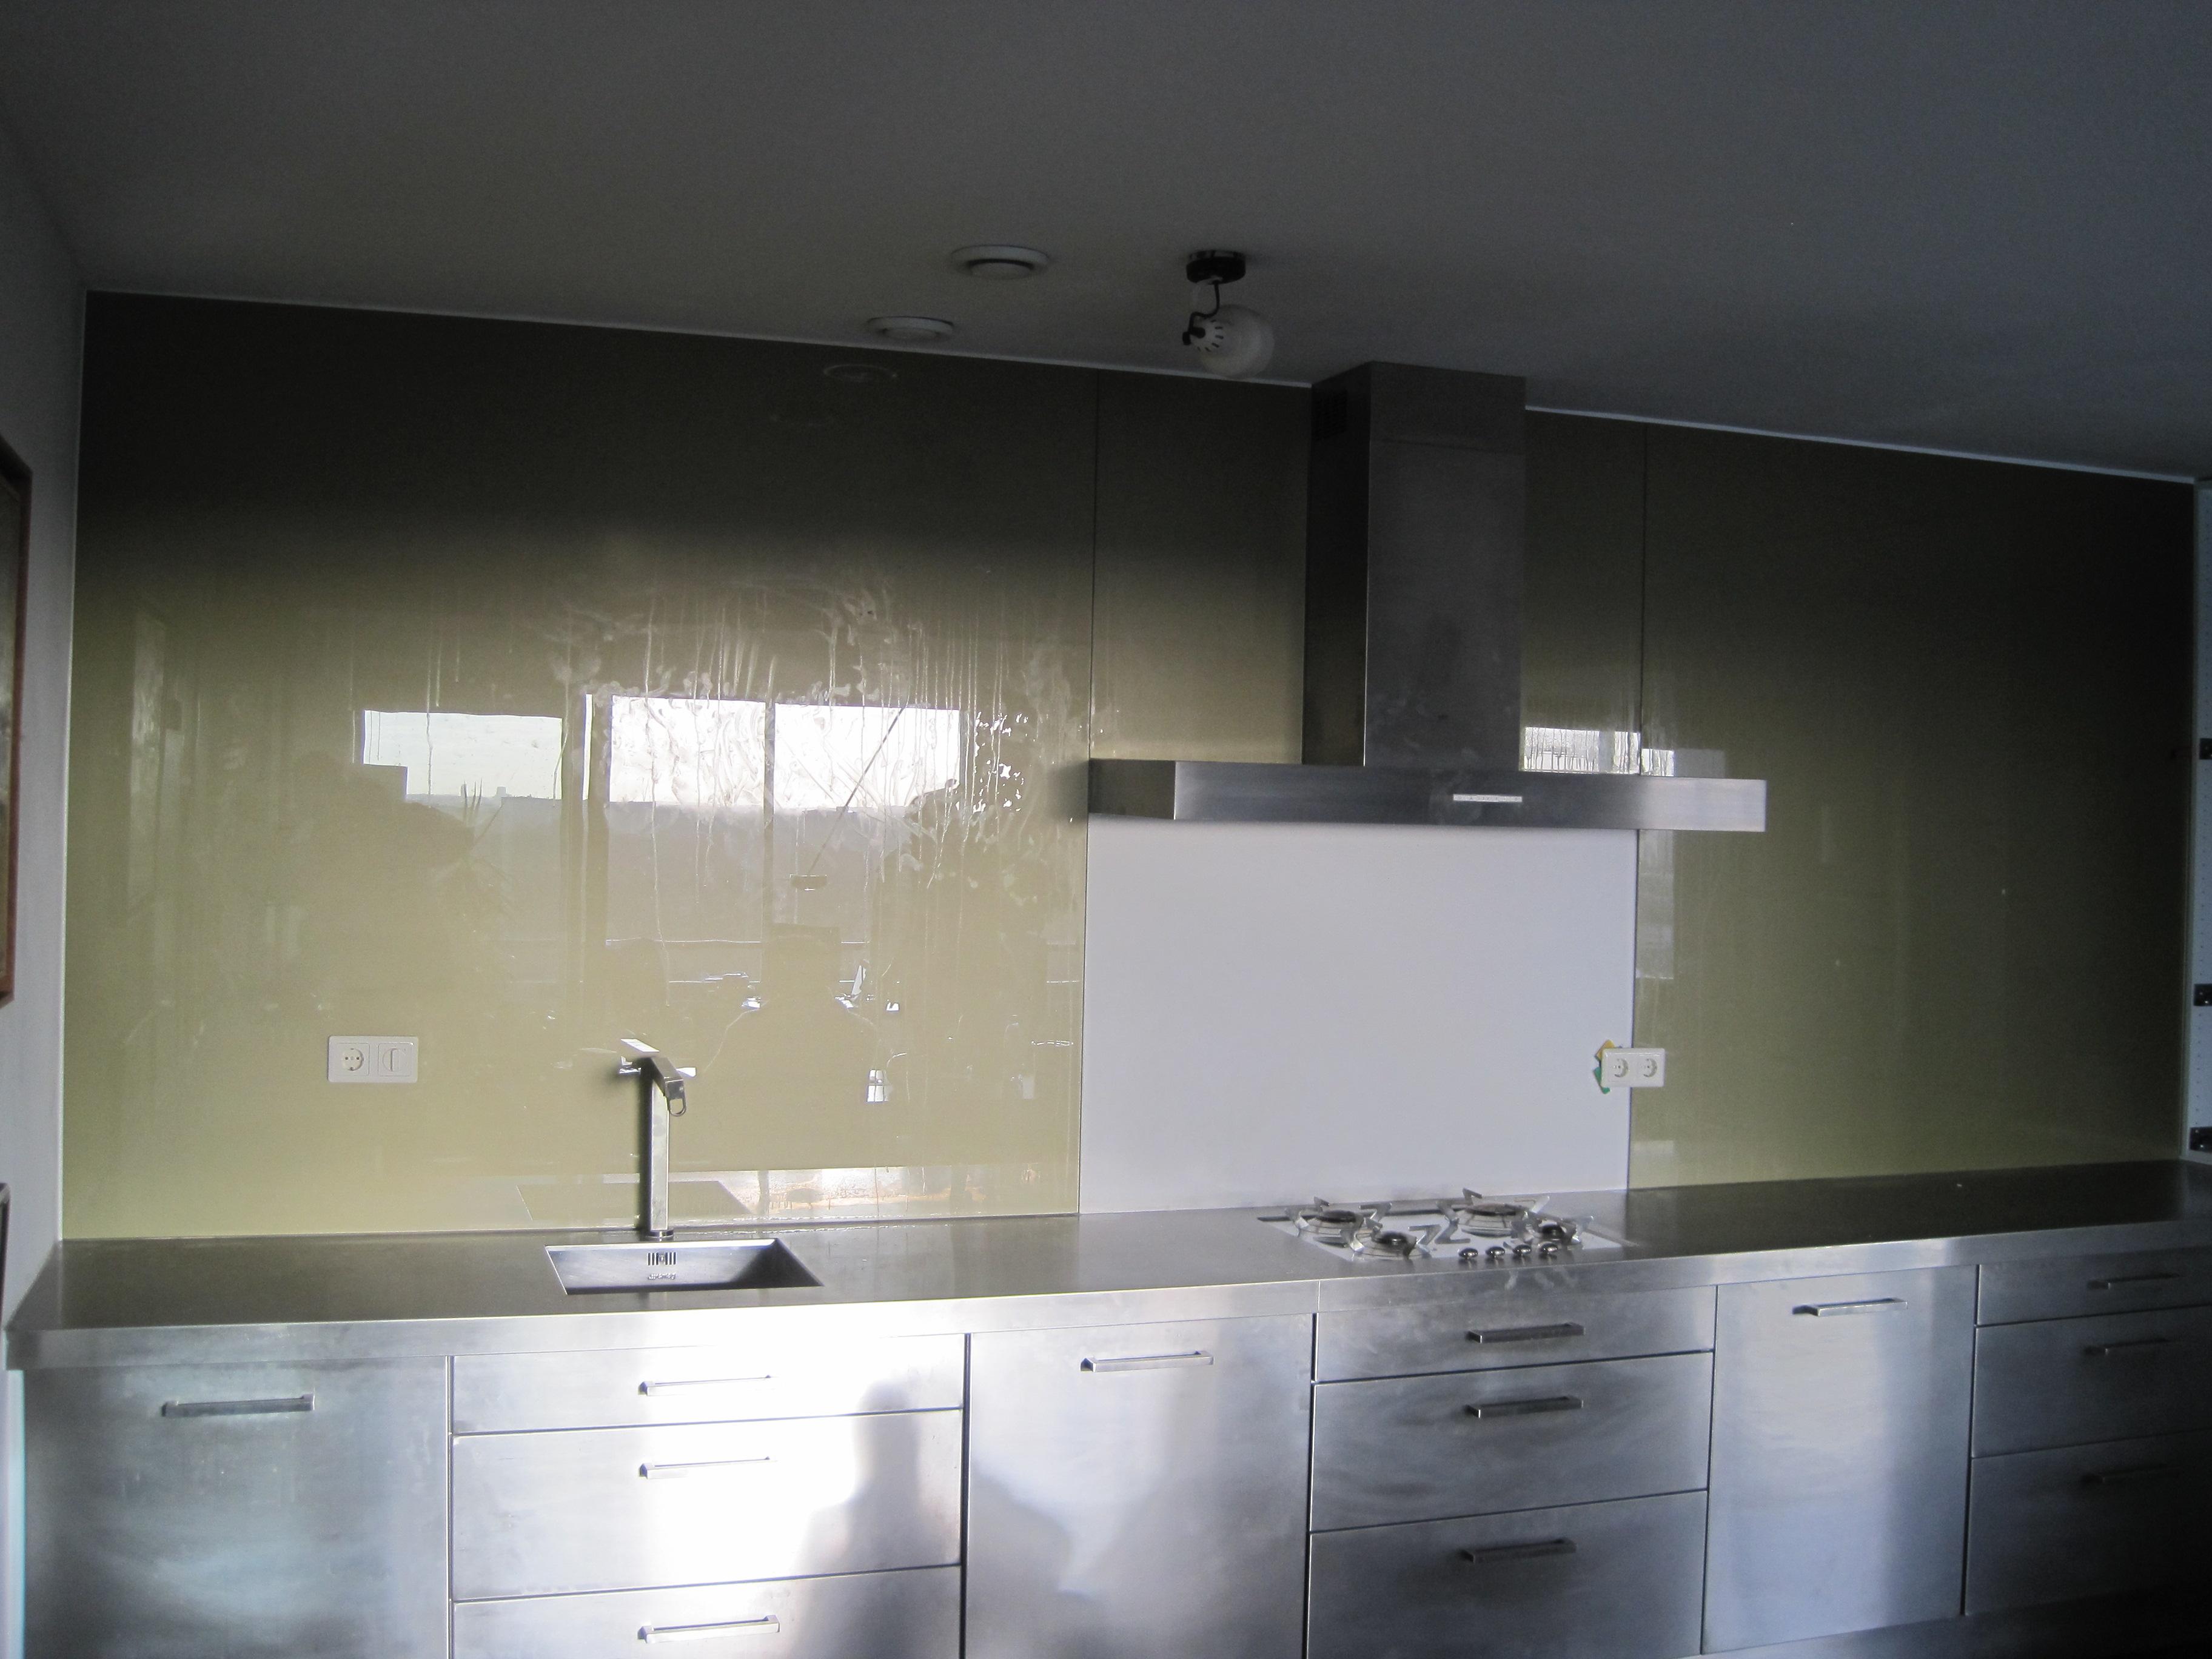 Glazen keuken achterwand